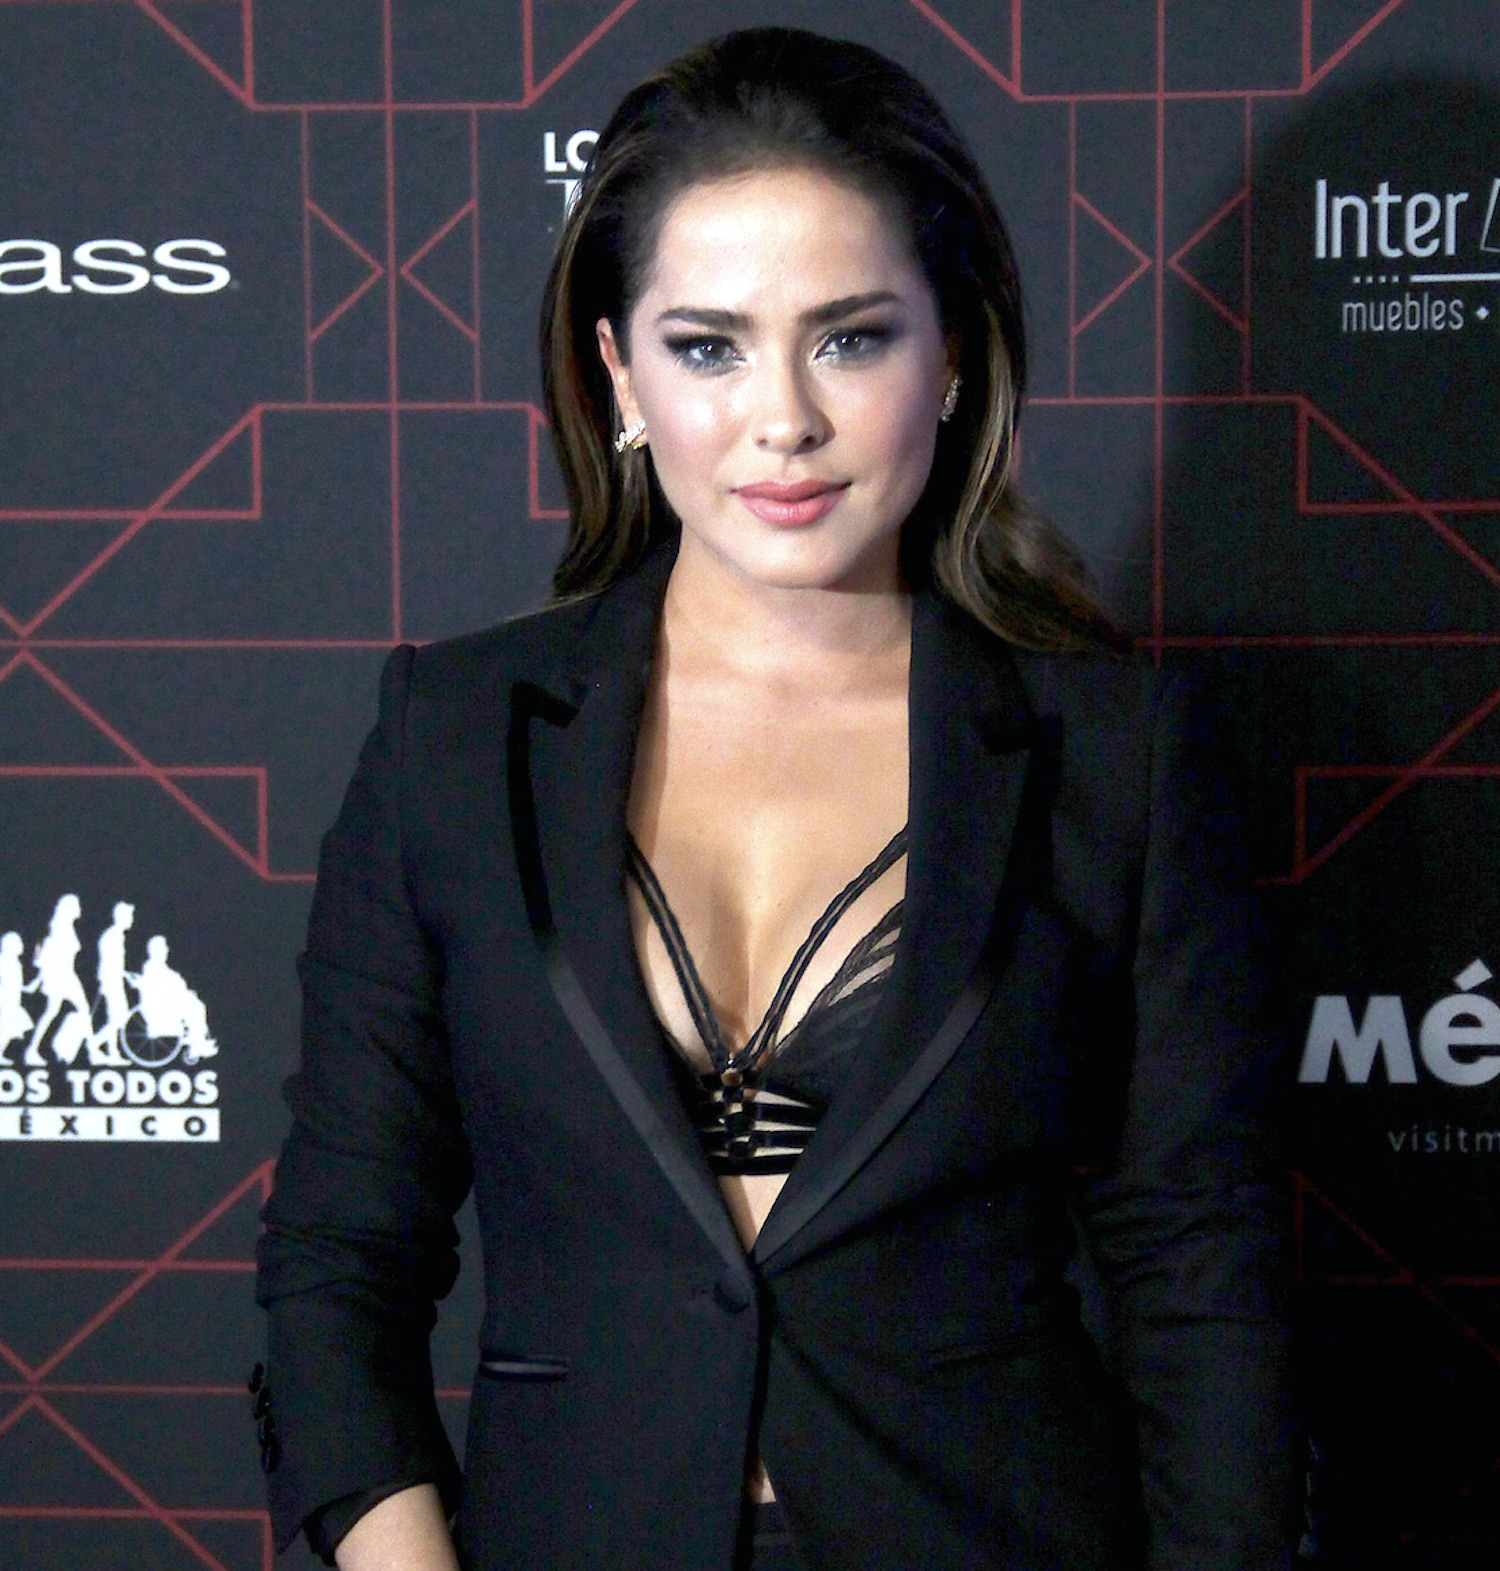 """Me agarró contra la pared y me empezó a tratar de desvestir"": Danna García revela que sufrió acoso"